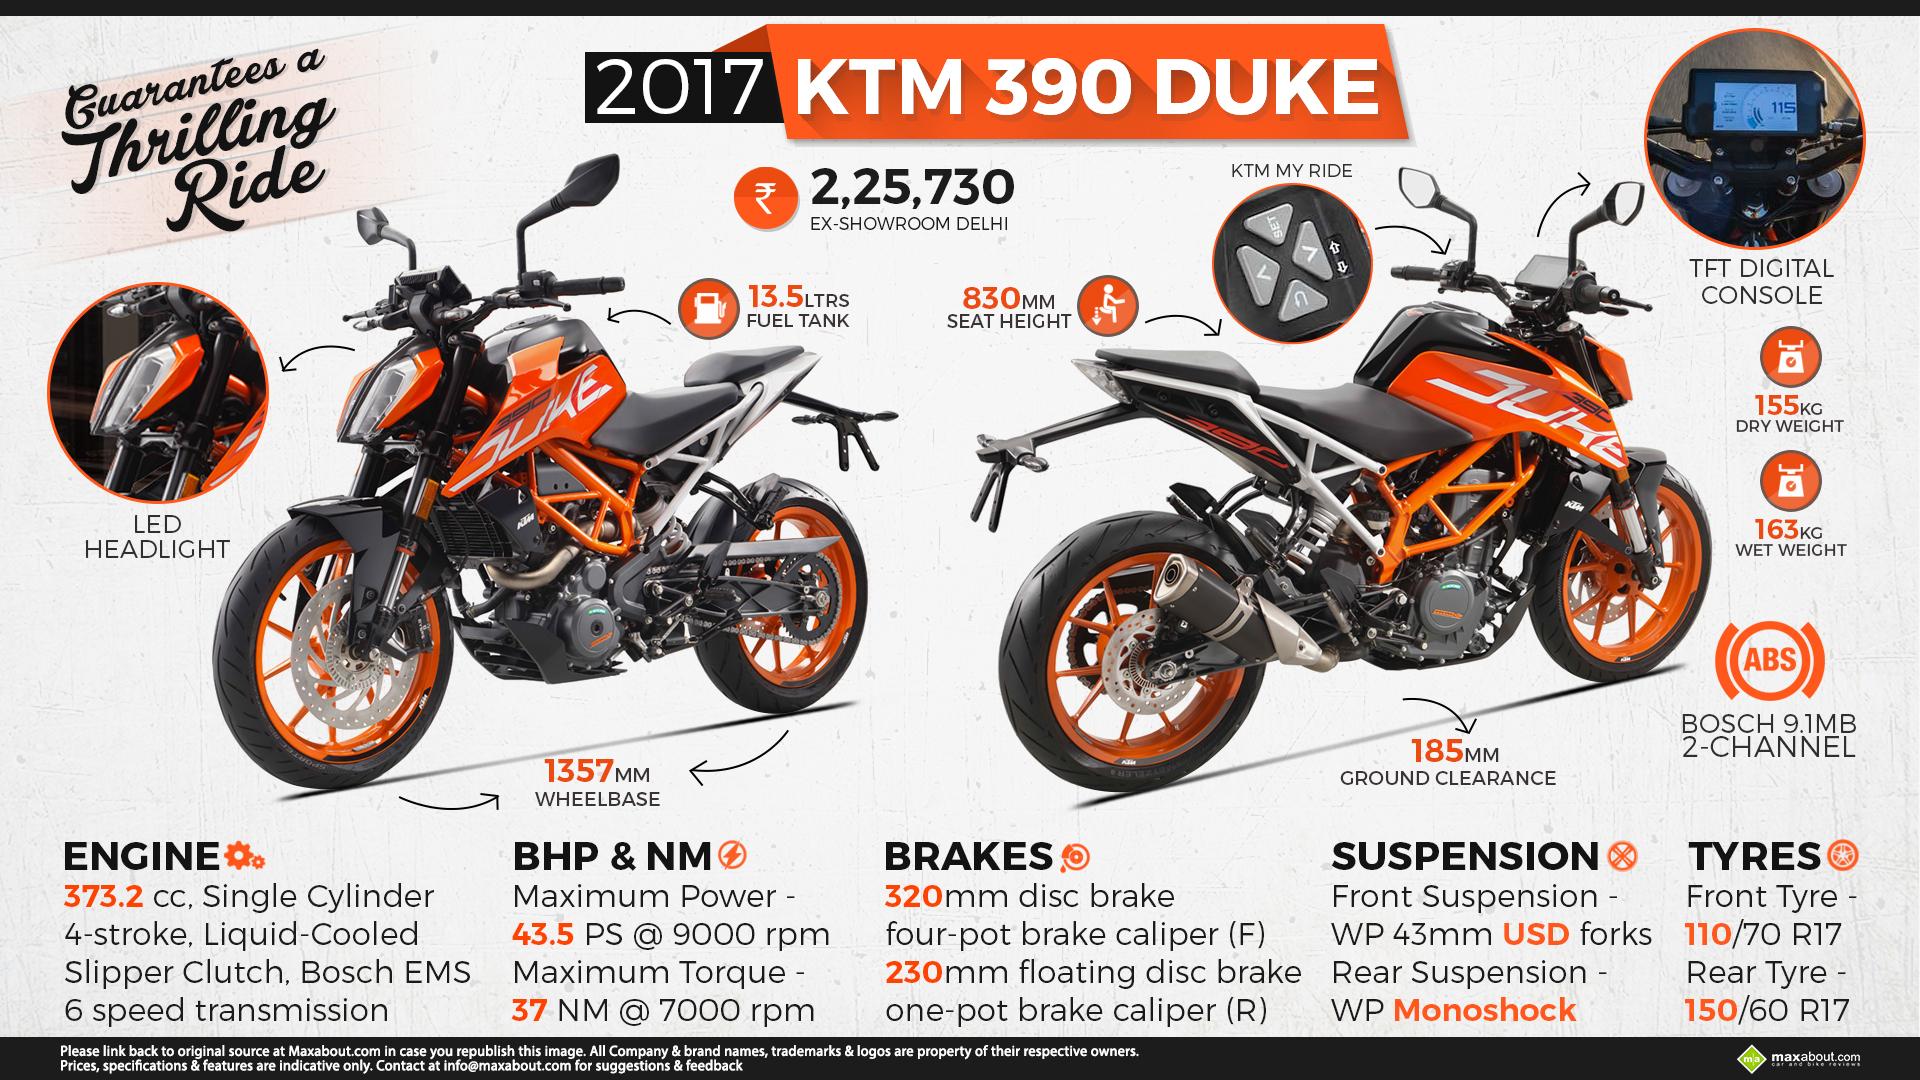 2017 KTM 390 Duke   Guarantees A Thrilling Ride 1920x1080